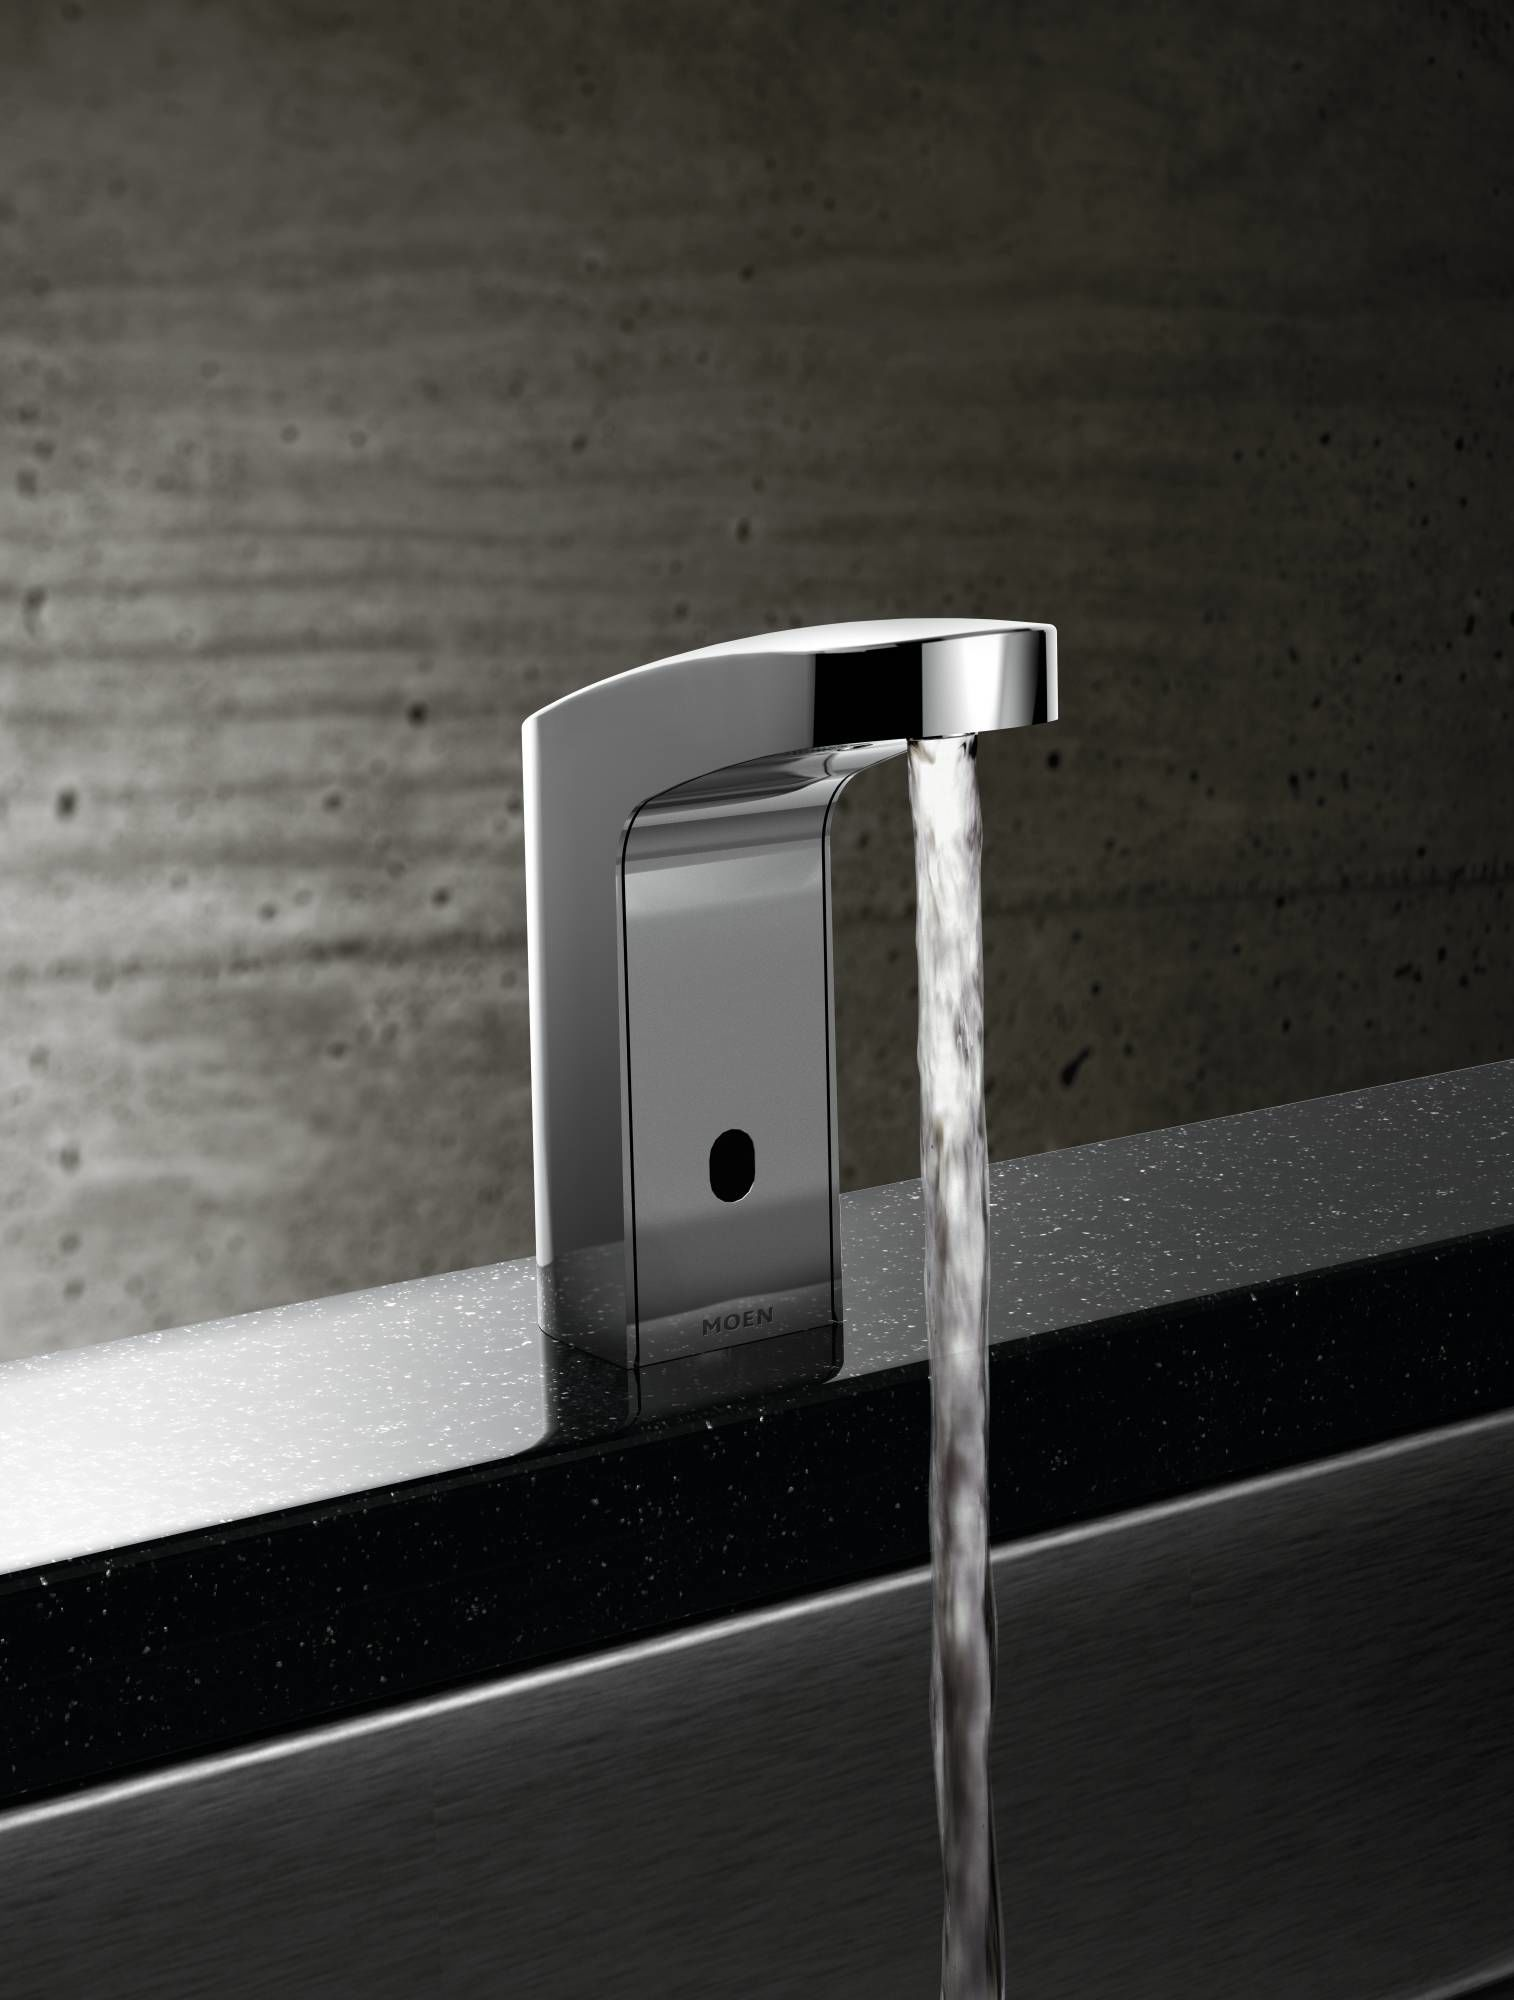 Moen 8551 Chrome Electronic Single Hole Bathroom Faucet with ...